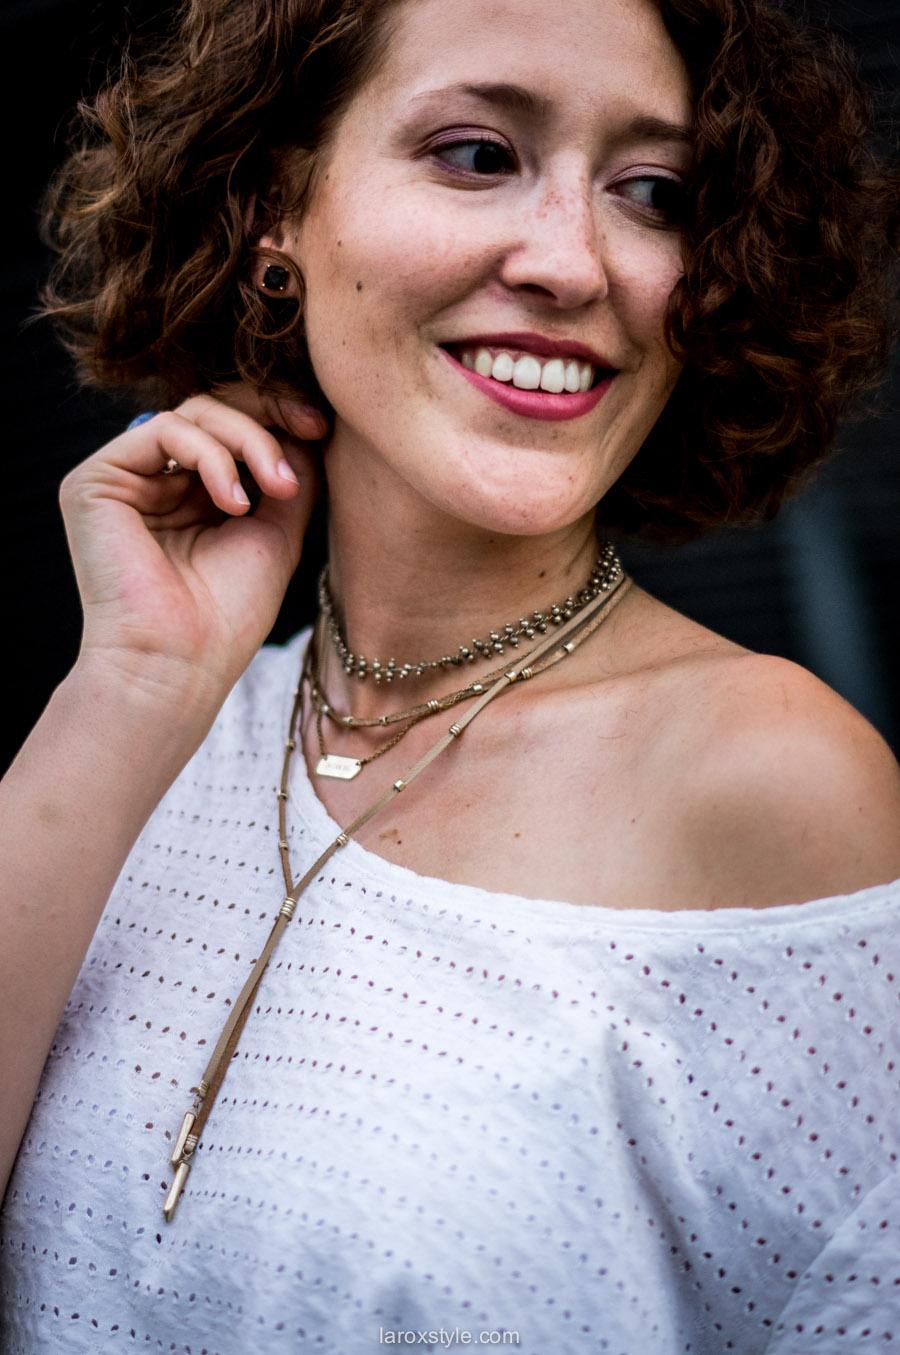 summer look chic - coiffeur confidences prestige - blog mode lyon-32